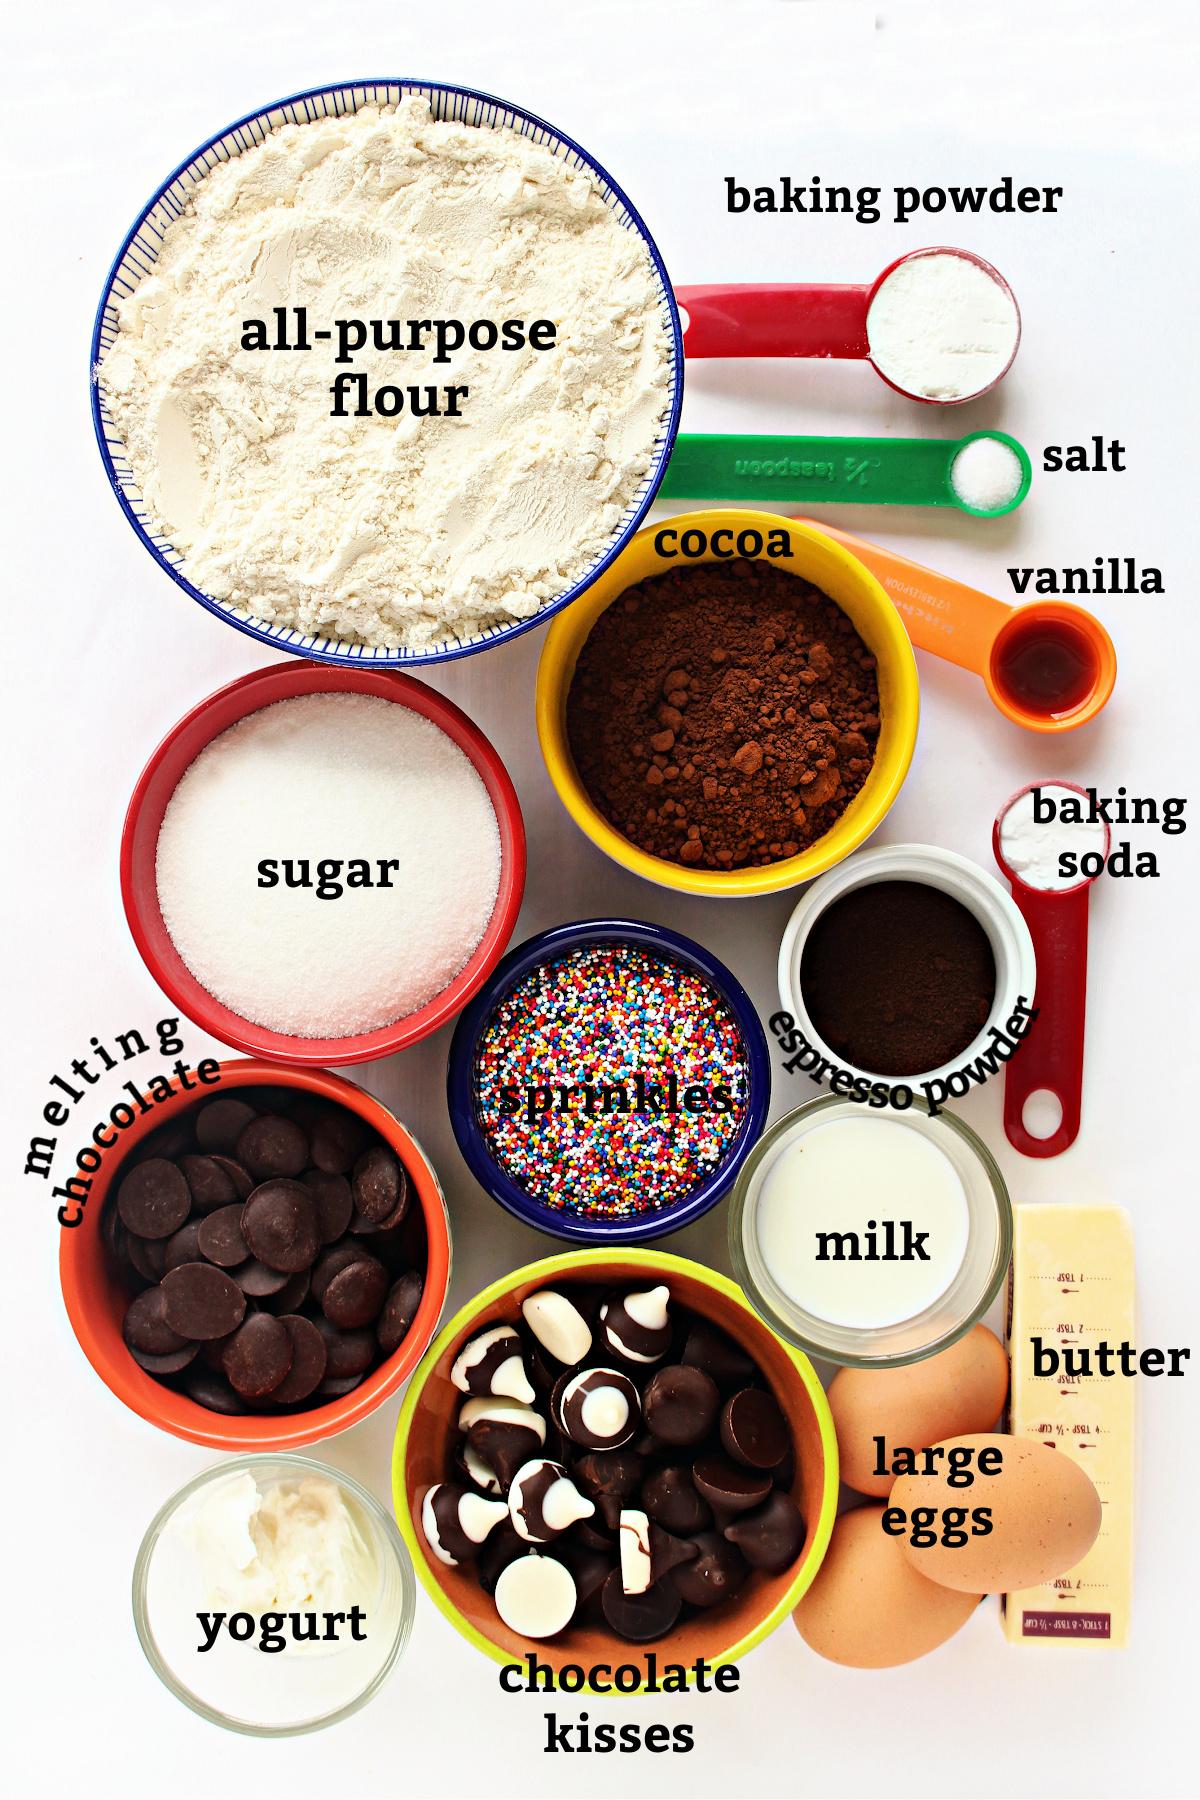 Recipe ingredients labeled flour, baking powder, salt, vanilla, cocoa, baking soda, sugar, eggs, butter, yogurt, chocolate.